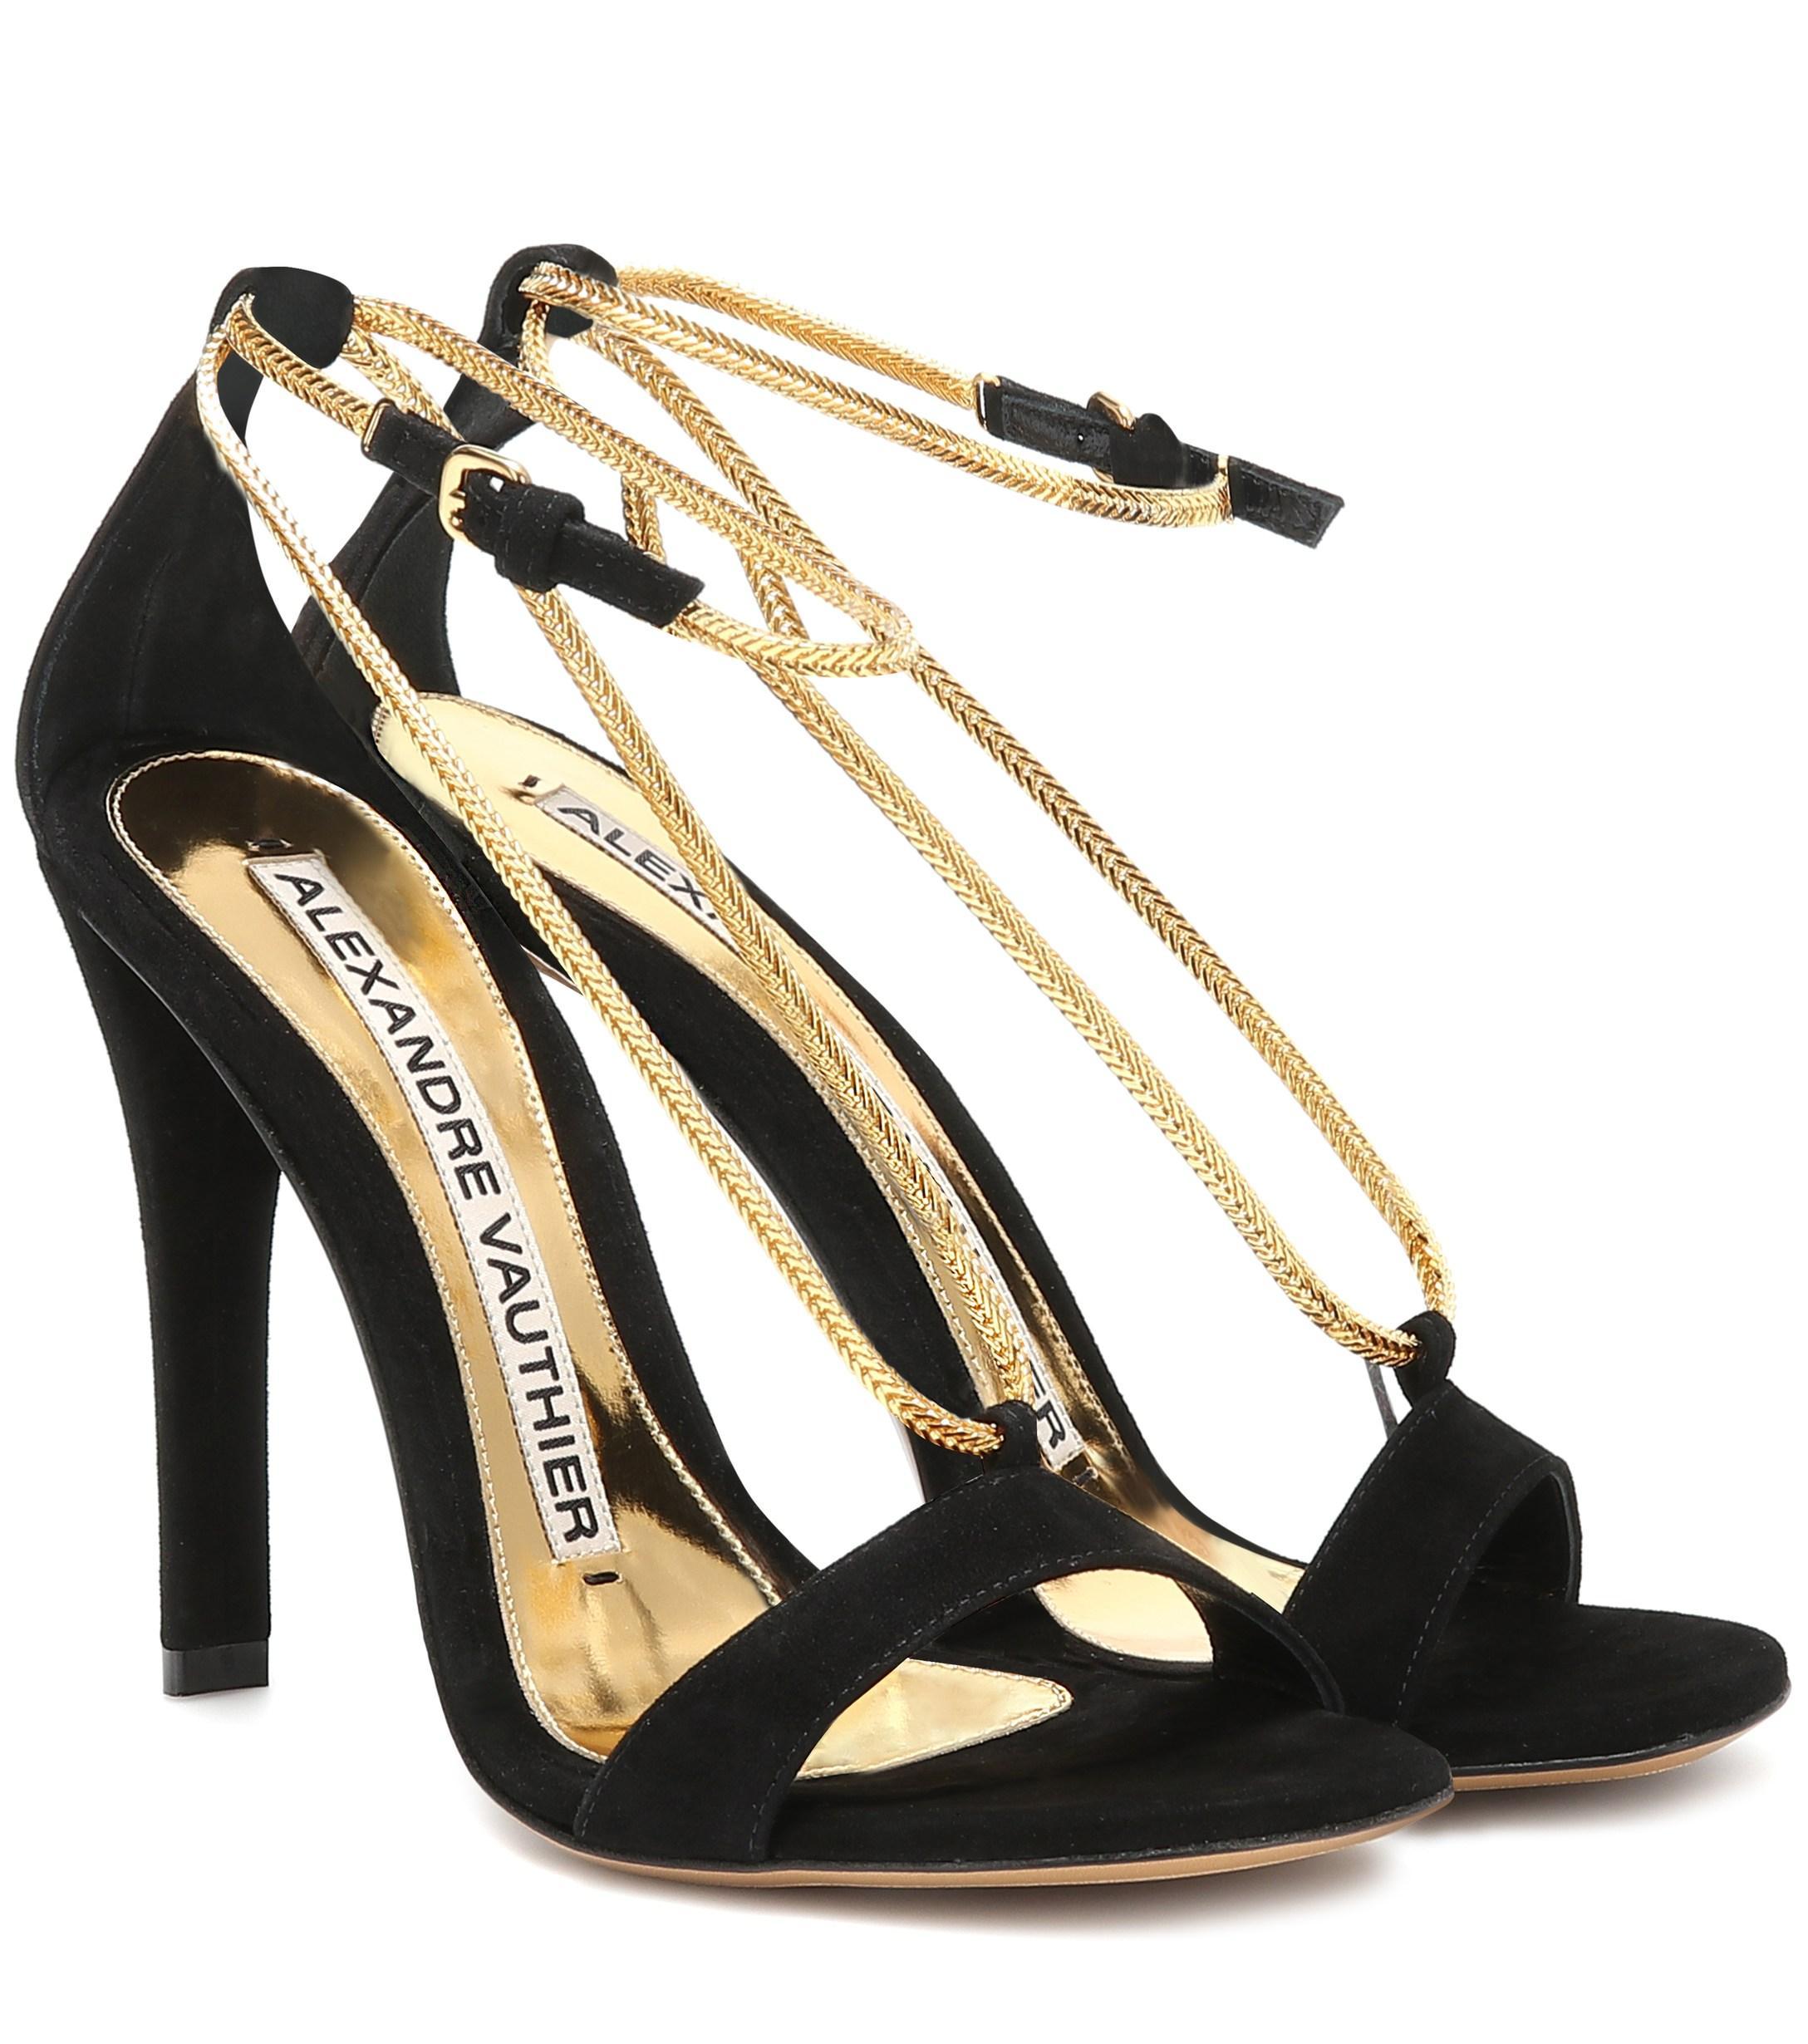 2f46d7e45ec494 Lyst - Alexandre Vauthier Alena Suede Sandals in Black